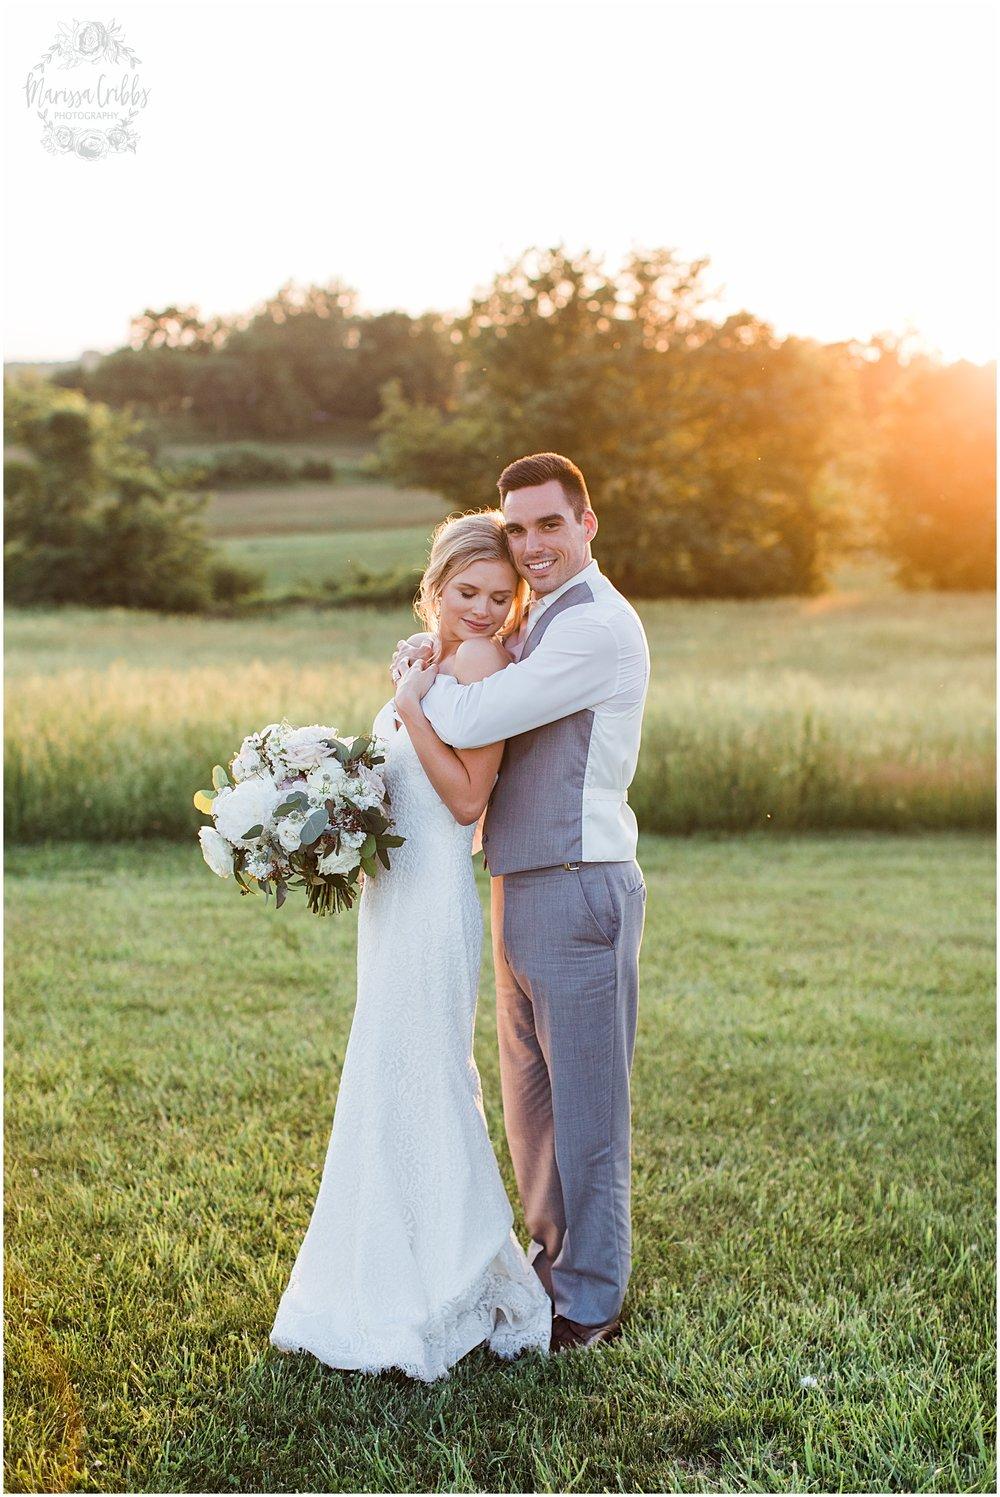 RHODES WEDDING | WESTON RED BARN FARM | MARISSA CRIBBS PHOTOGRAPHY_5318.jpg